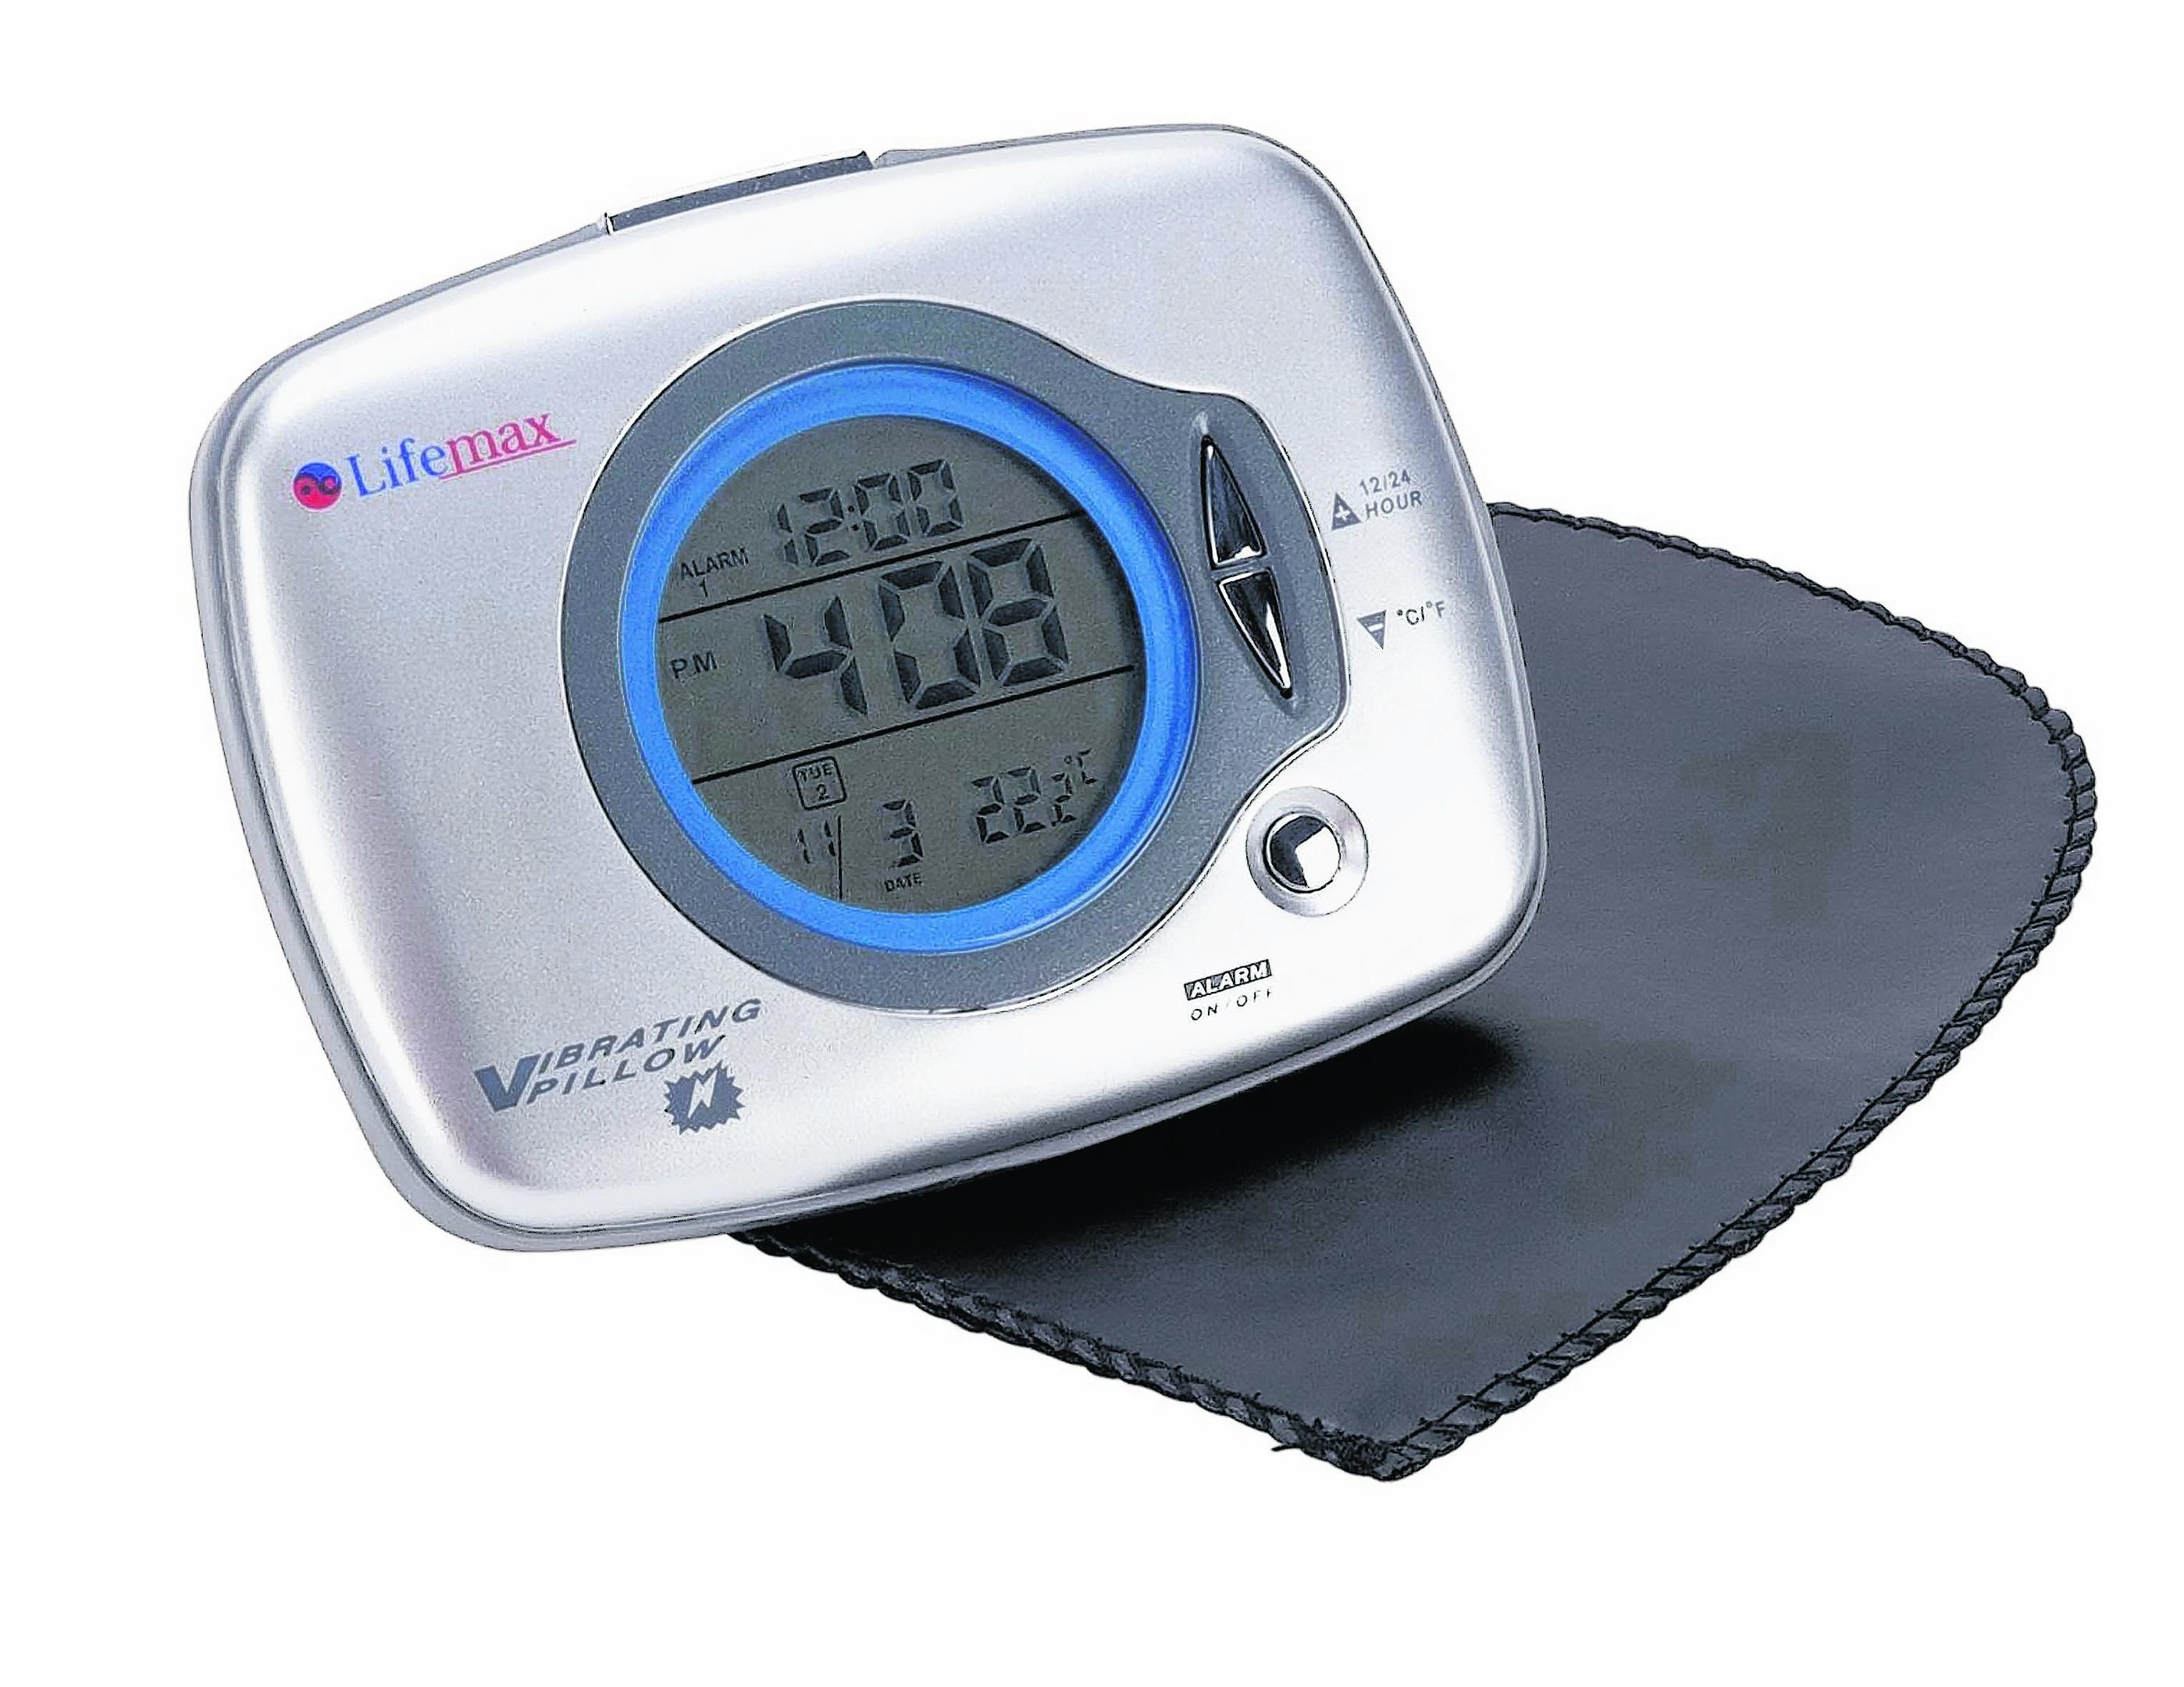 GADGETS Alarm Clocks 092306